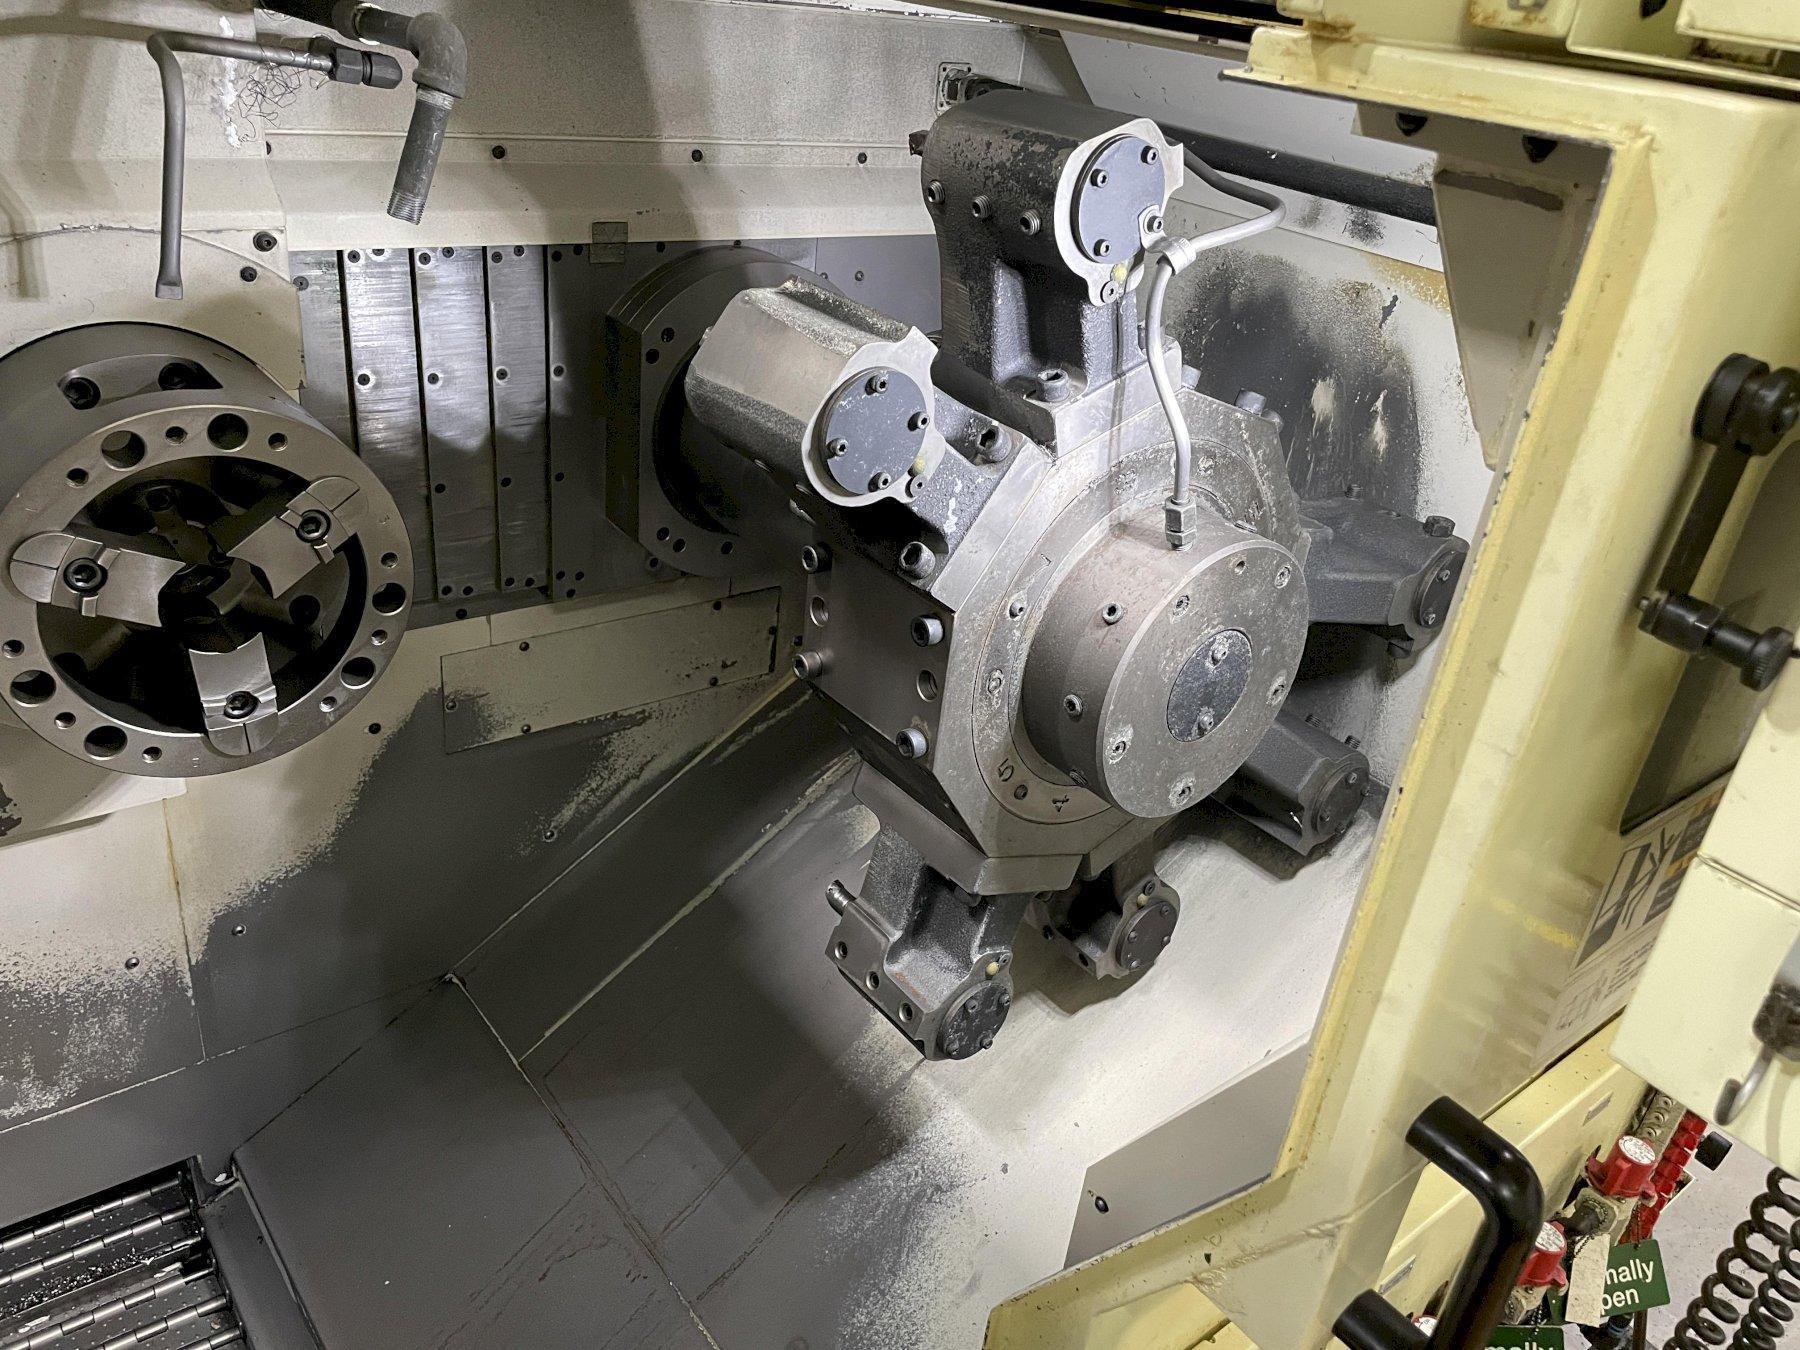 2016 Muratec MW-180  Twin Spindle CNC Horizontal Lathe